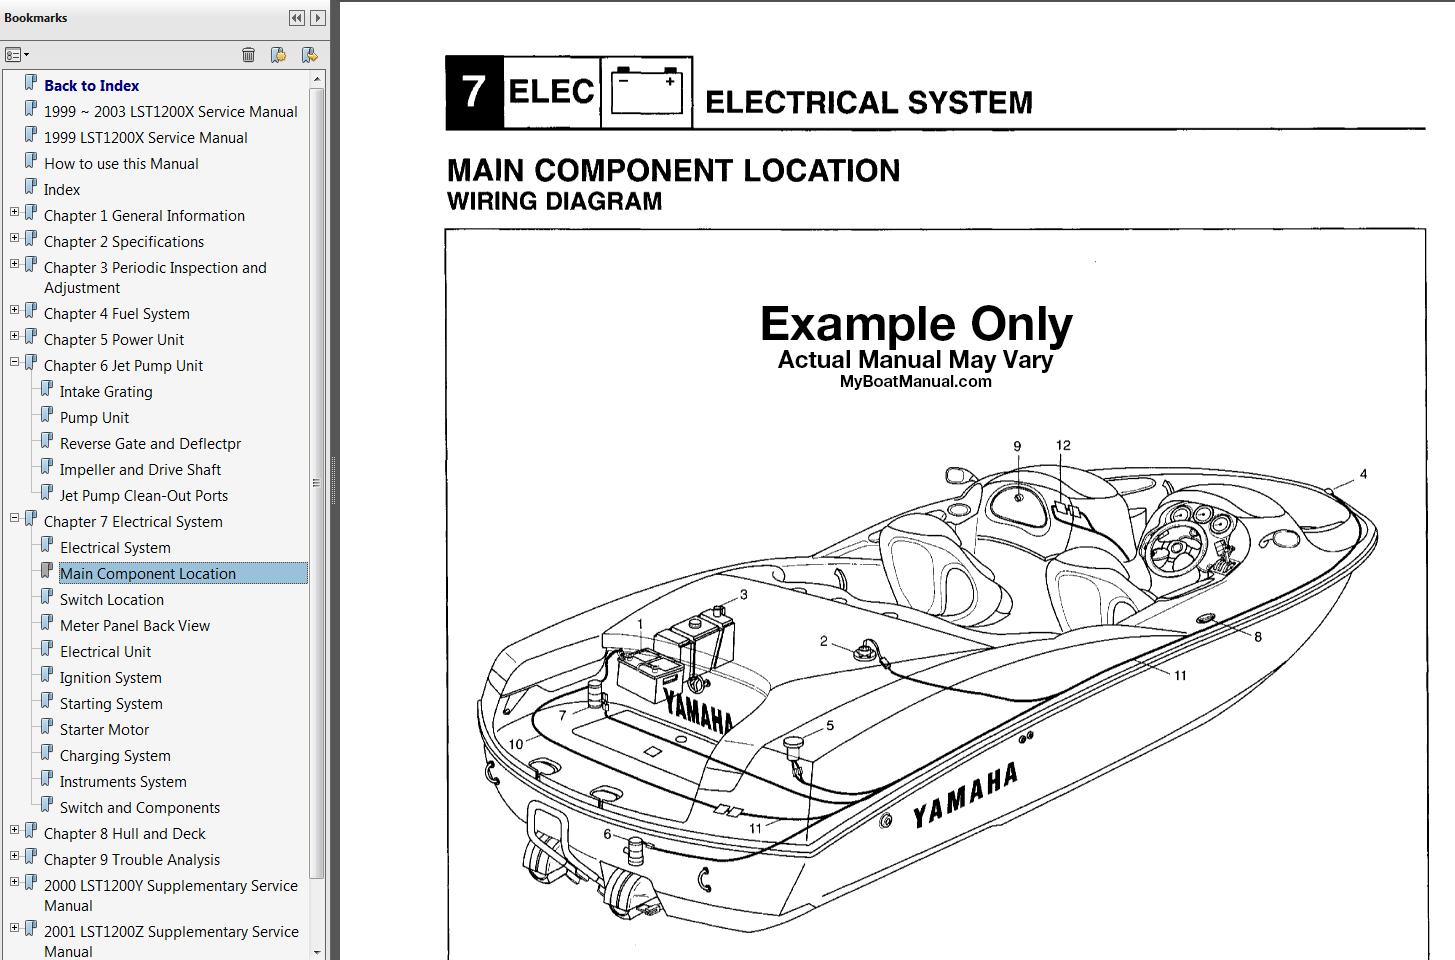 sample1?resize=665%2C439&ssl=1 diagrams 521450 jet boat wiring diagram jet boat engine harness jet boat wiring diagram at webbmarketing.co